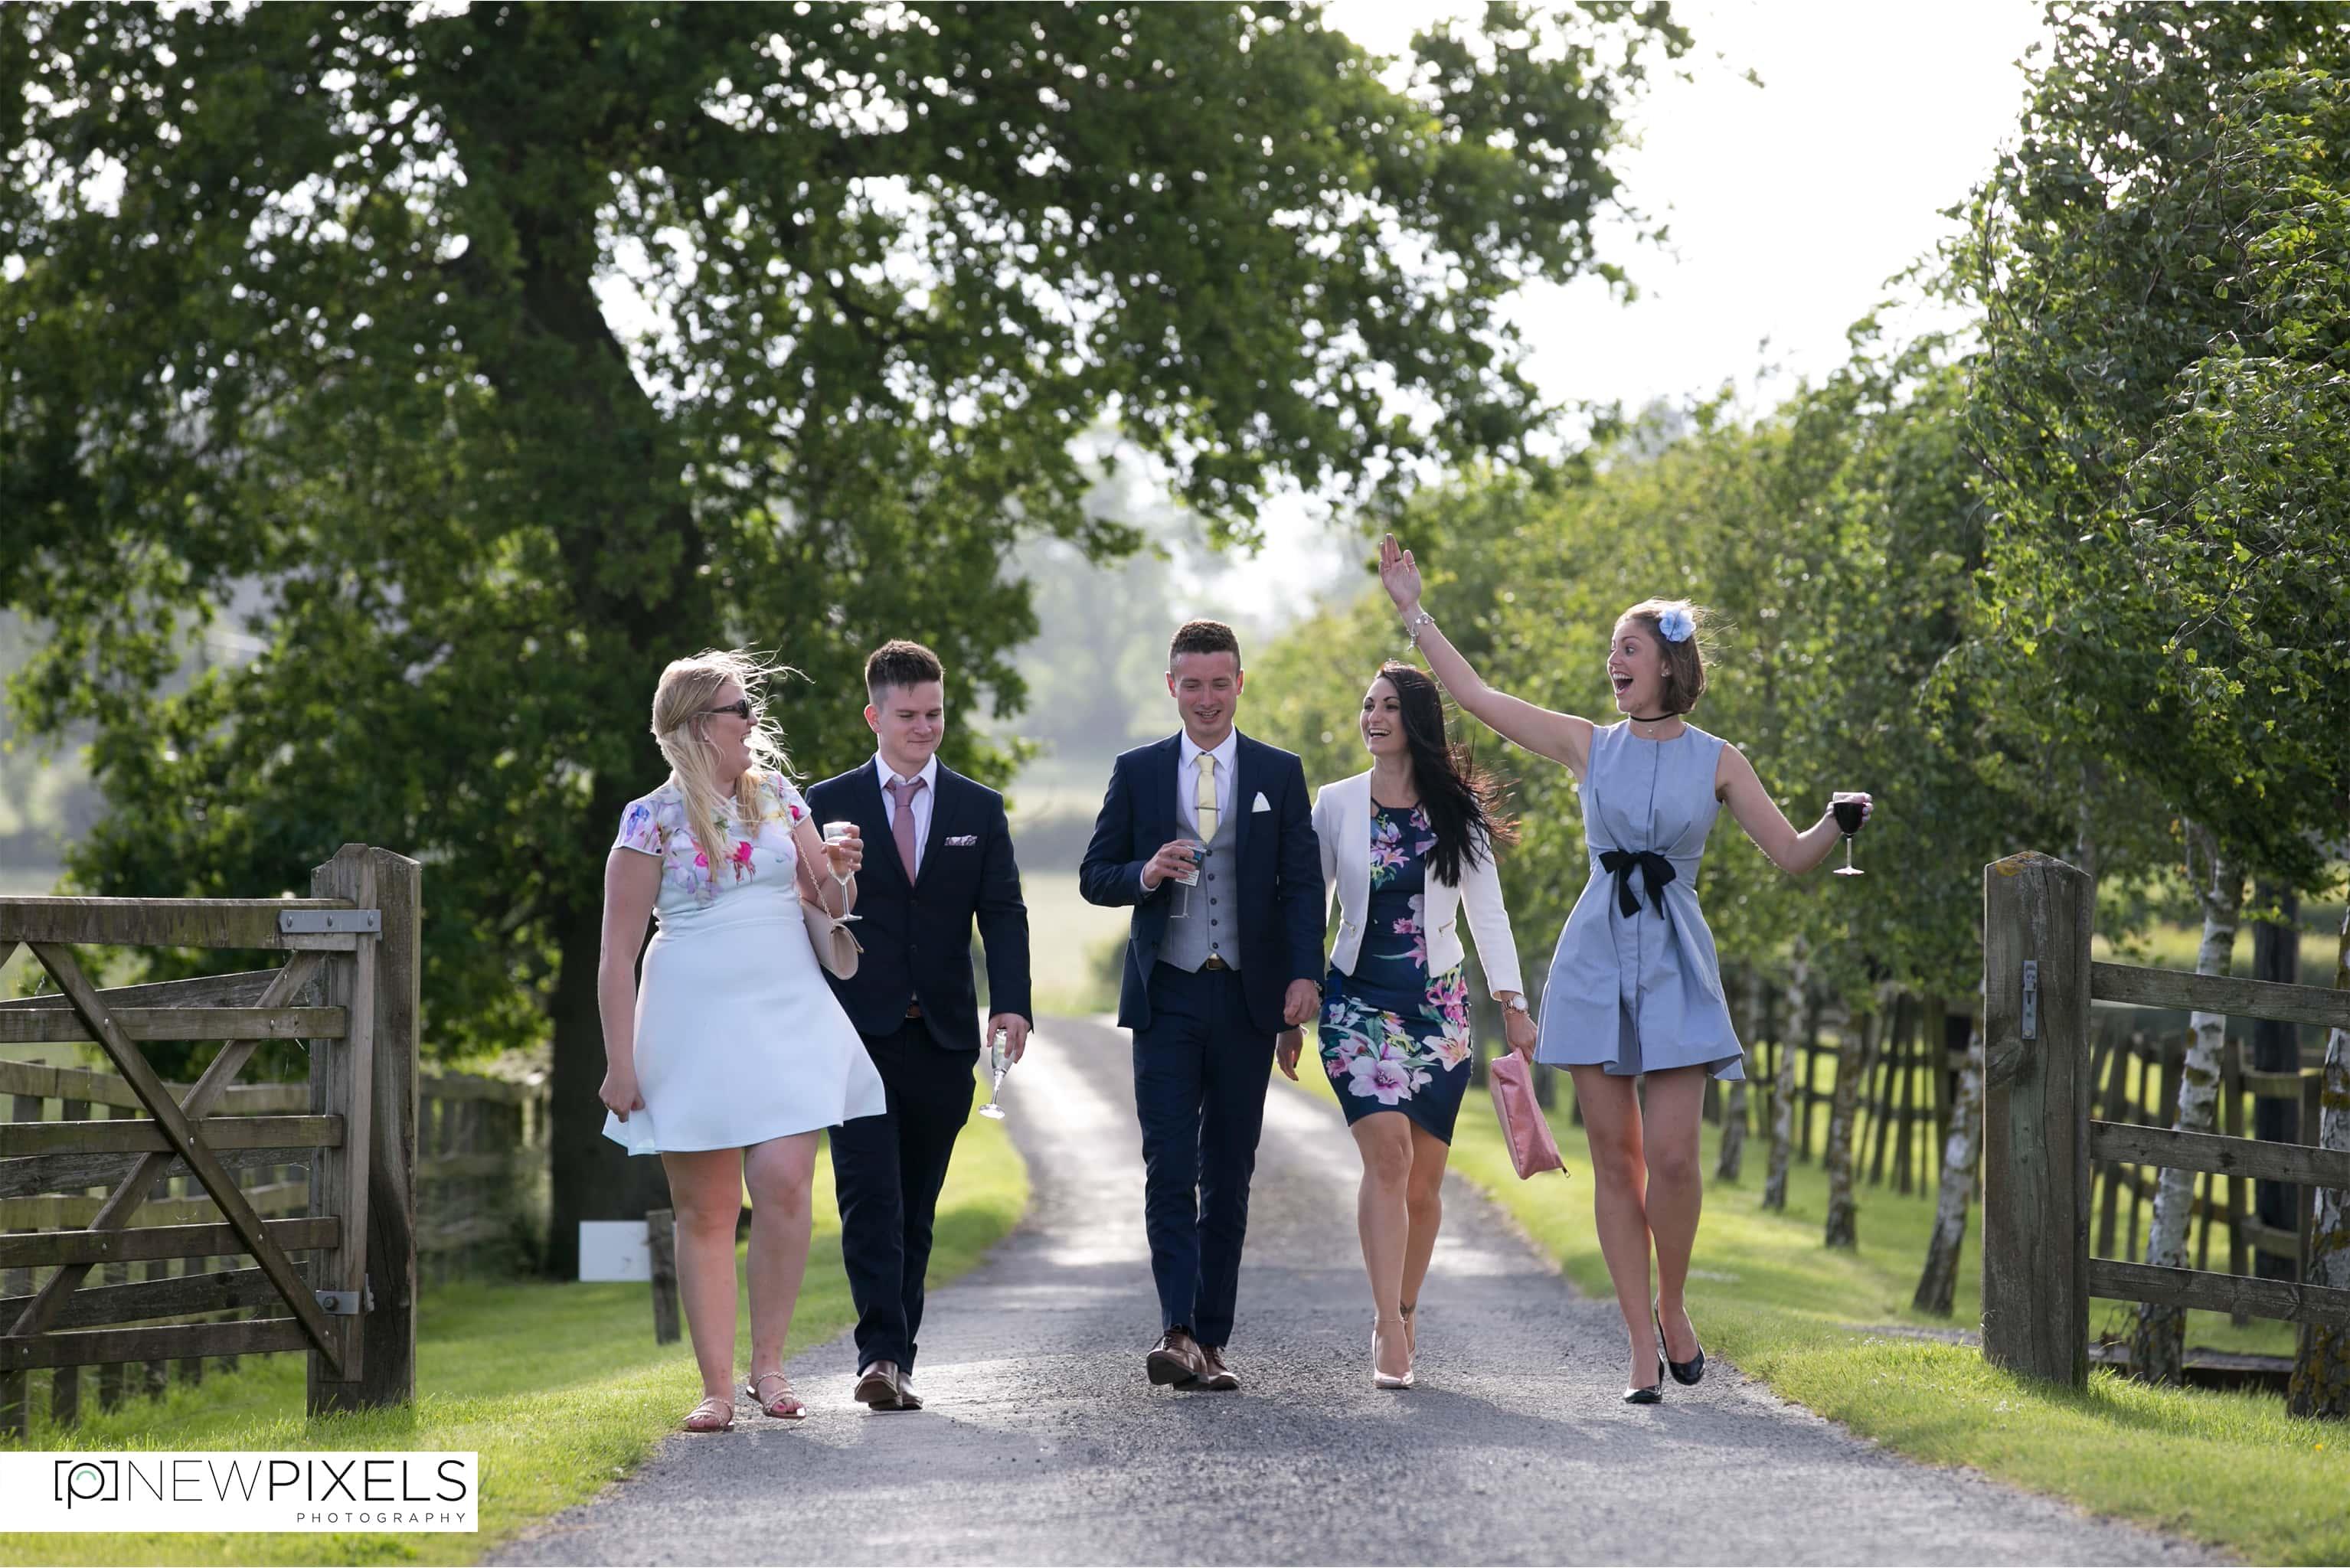 Hertfordshire Wedding Photography- New Pixels101